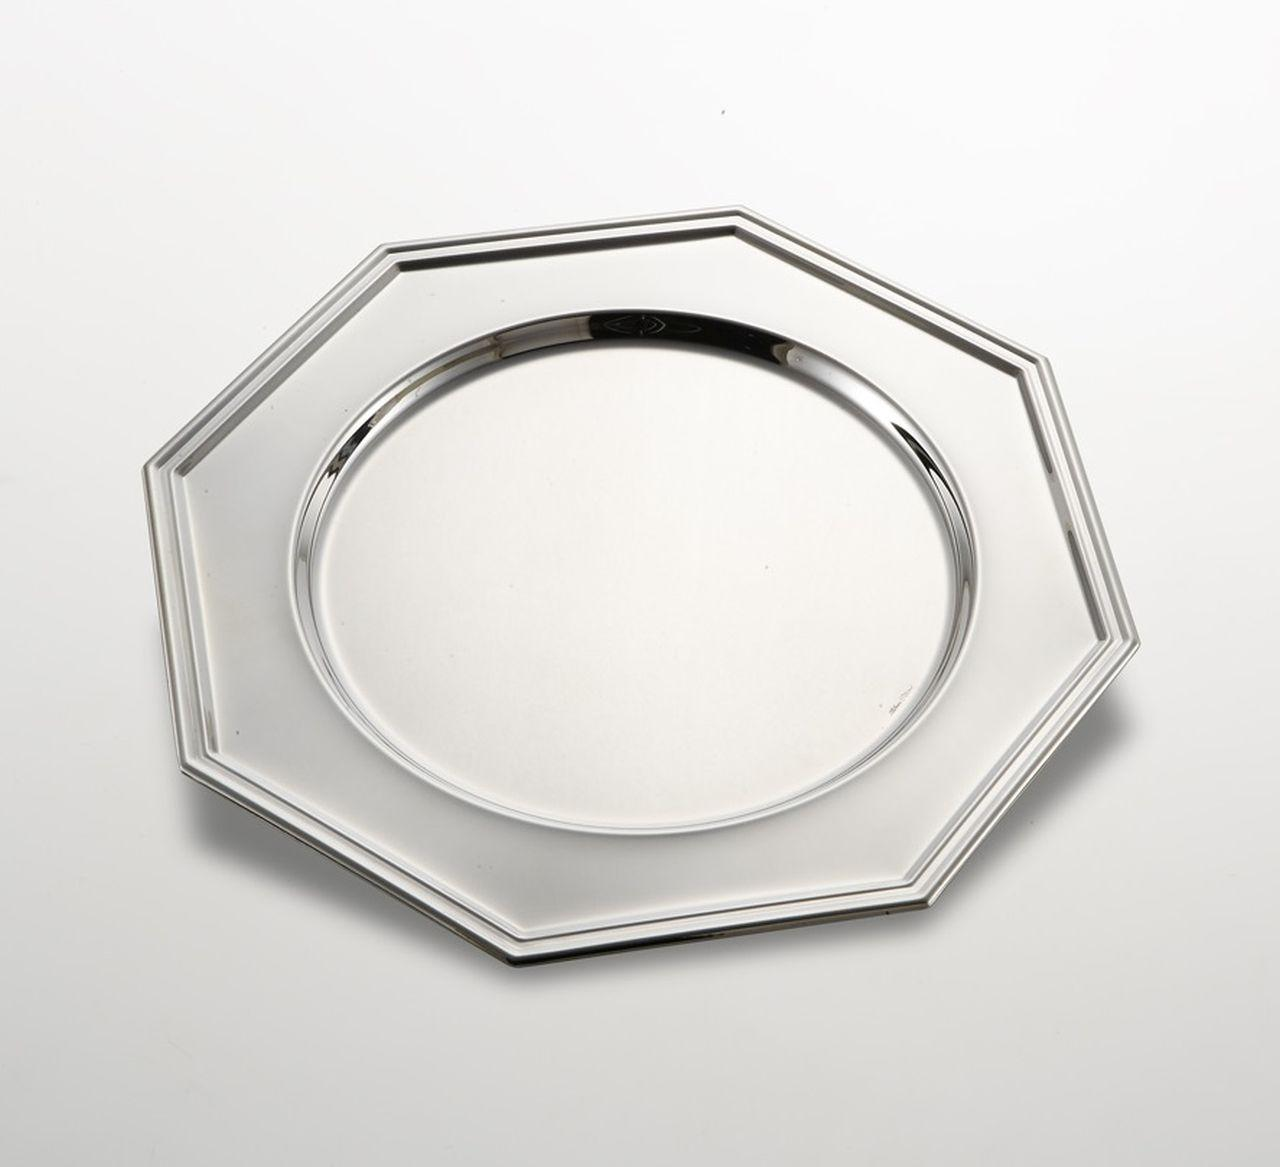 Sottopiatto ottagonale stile inglese argentato argento sheffield cm.diam.30